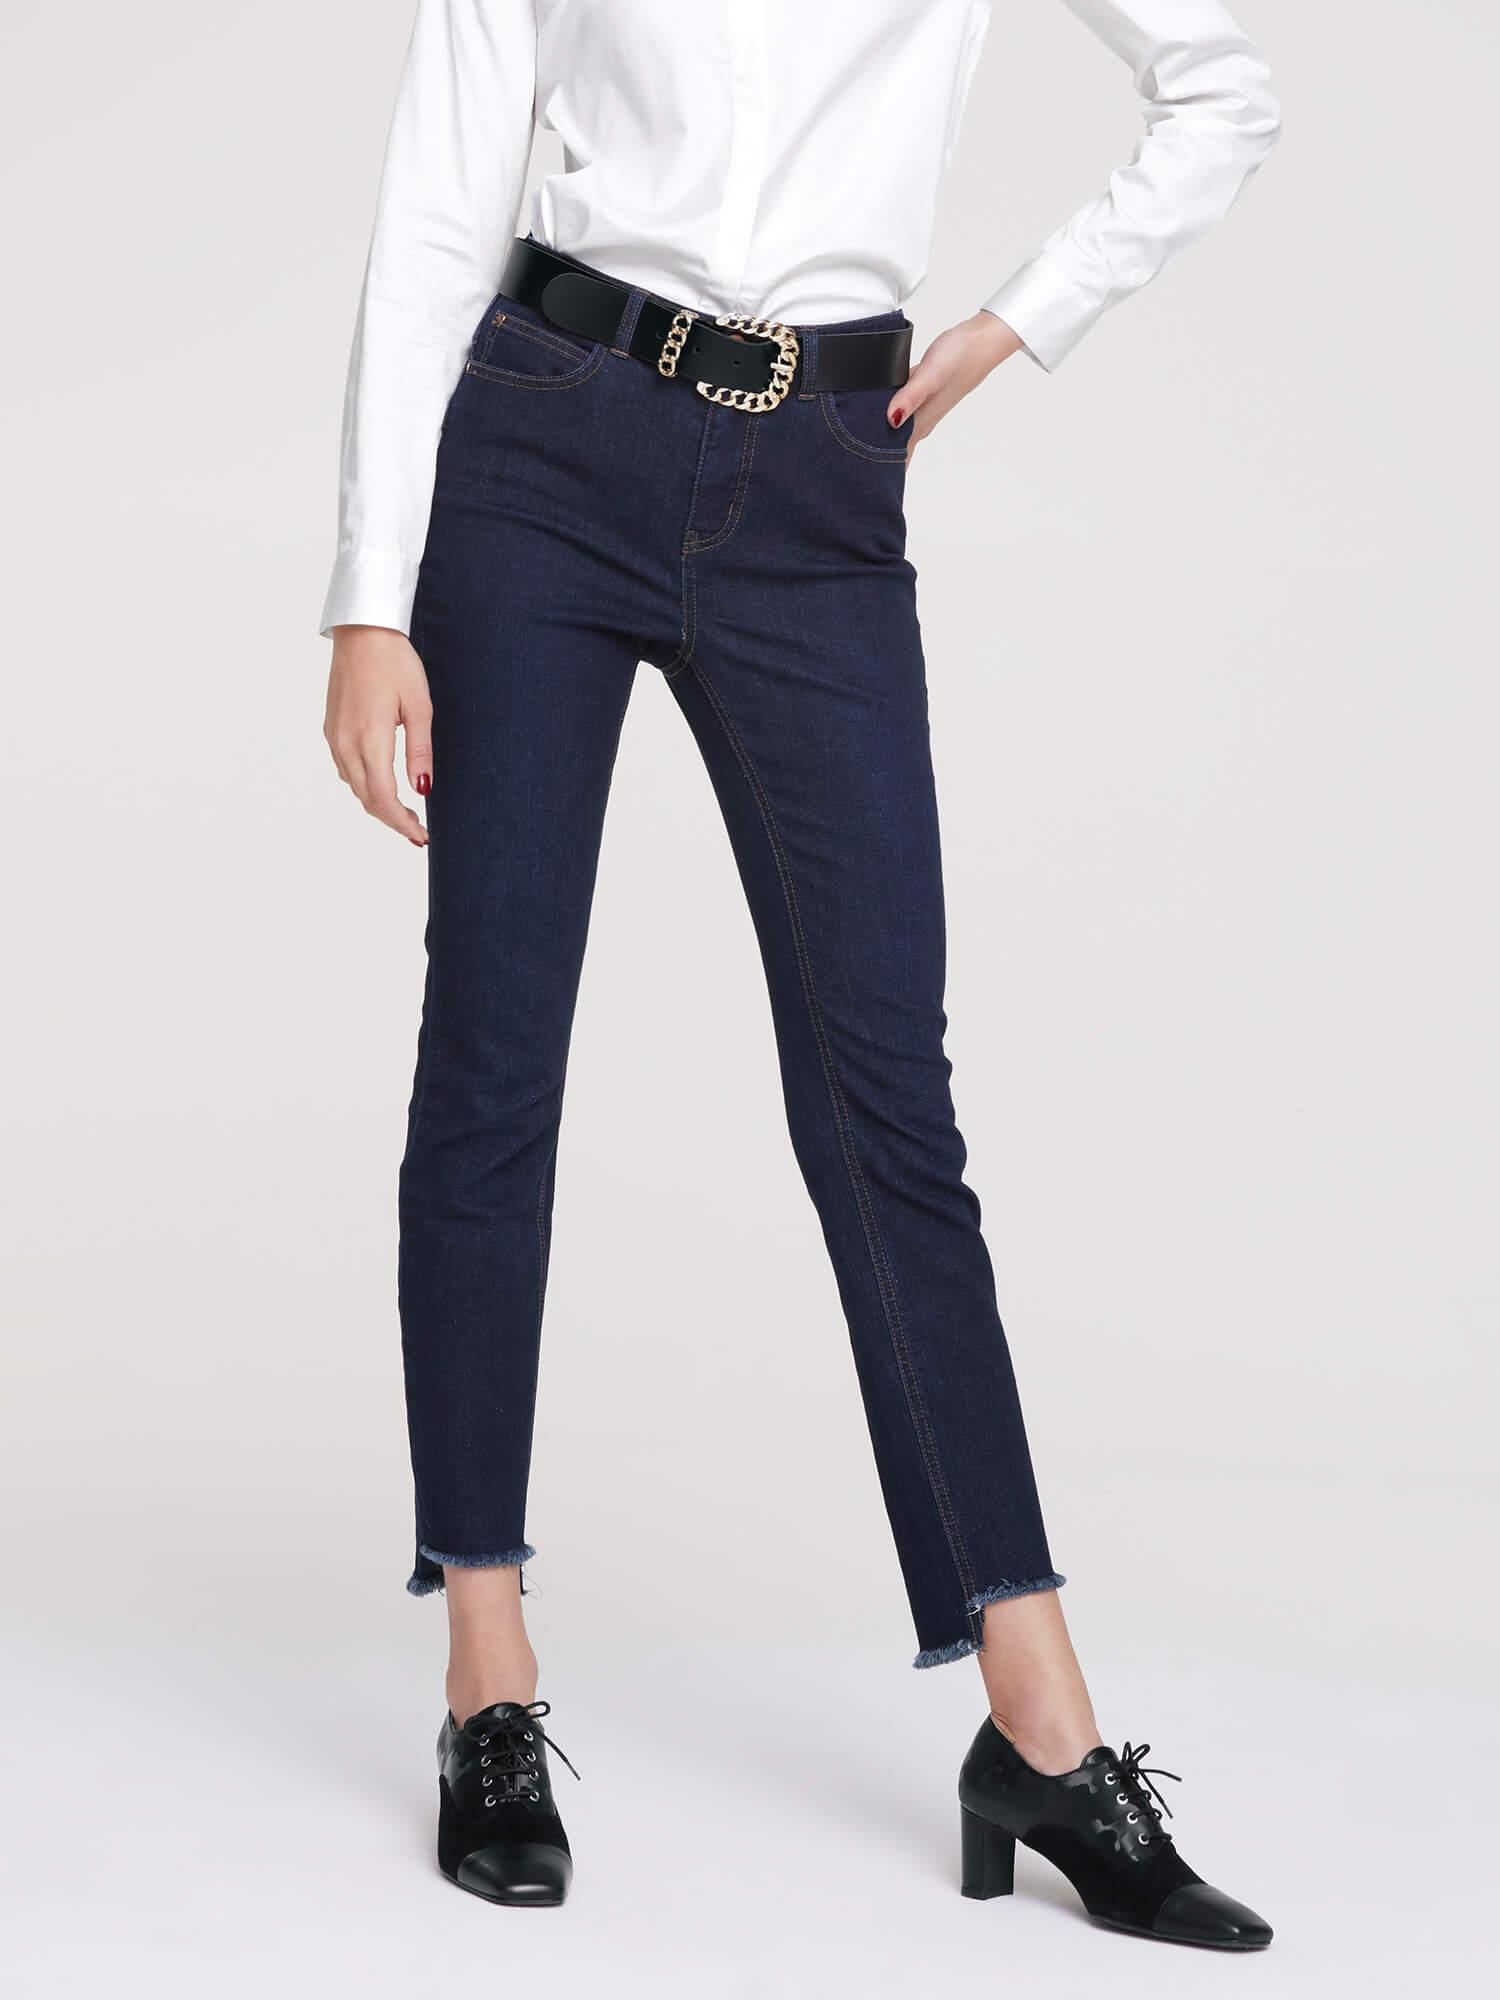 Dunkle Damen-Jeans.